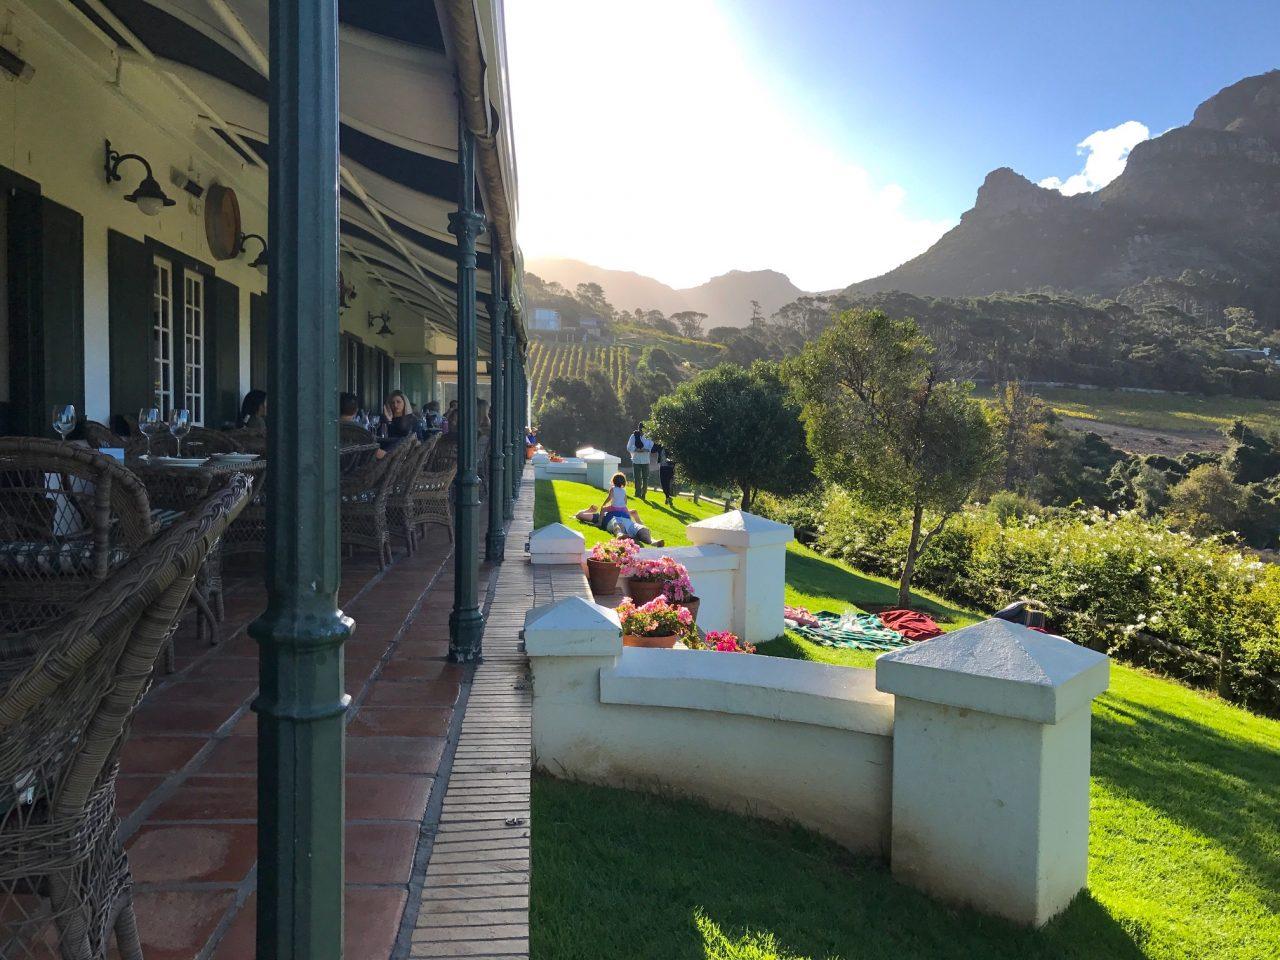 Varanda da vinícola Constantia Glen, África do Sul - foto: Renato Salles